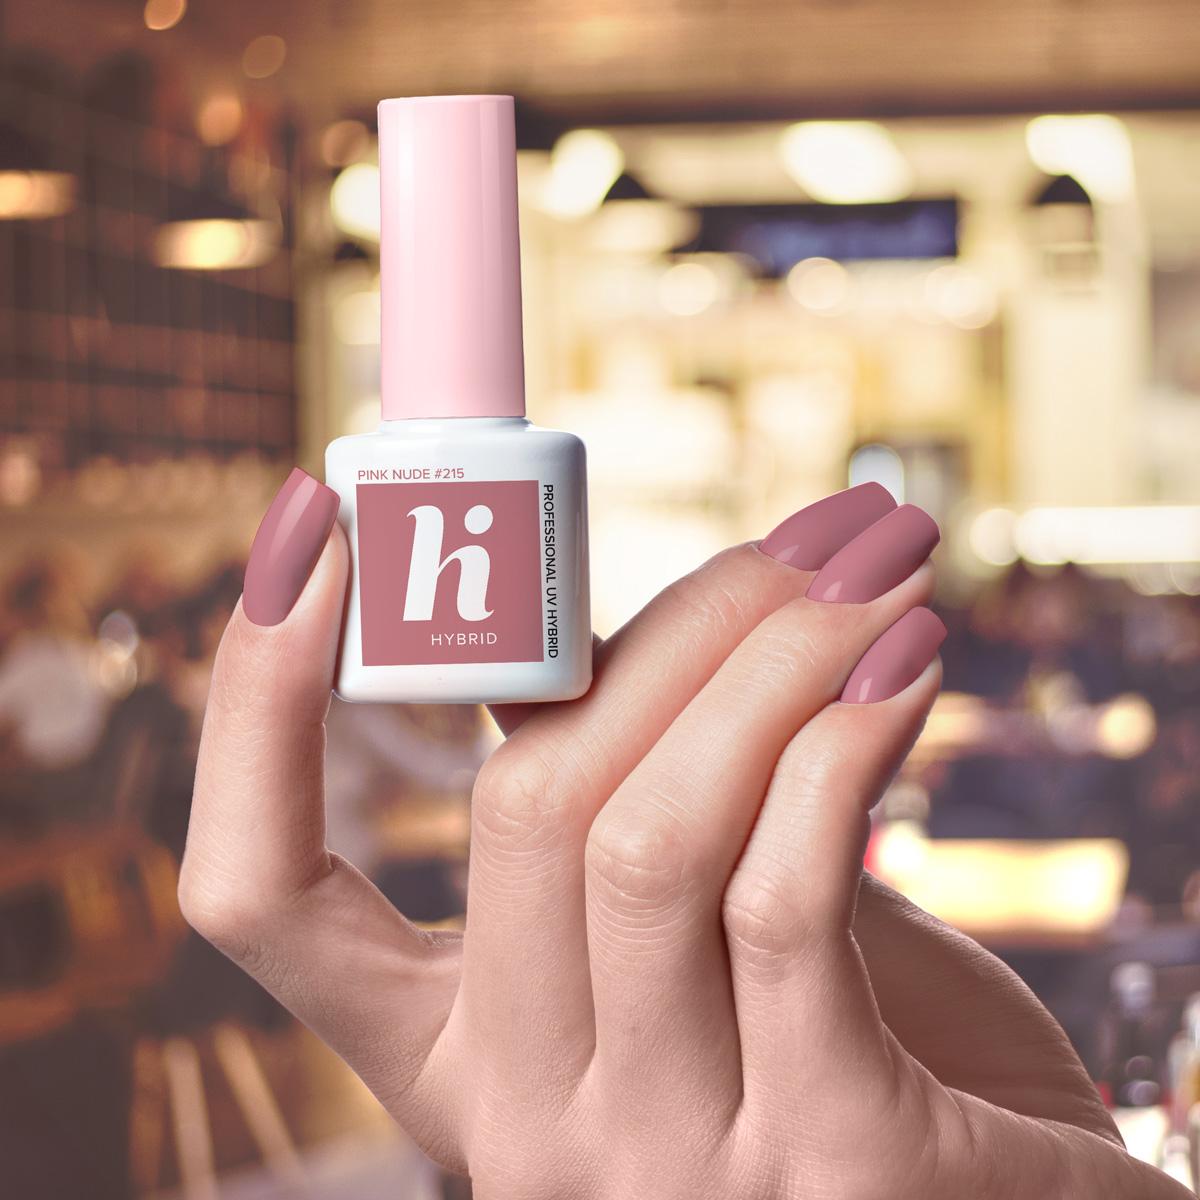 215 lakier hi hybrid pink nude 5ml